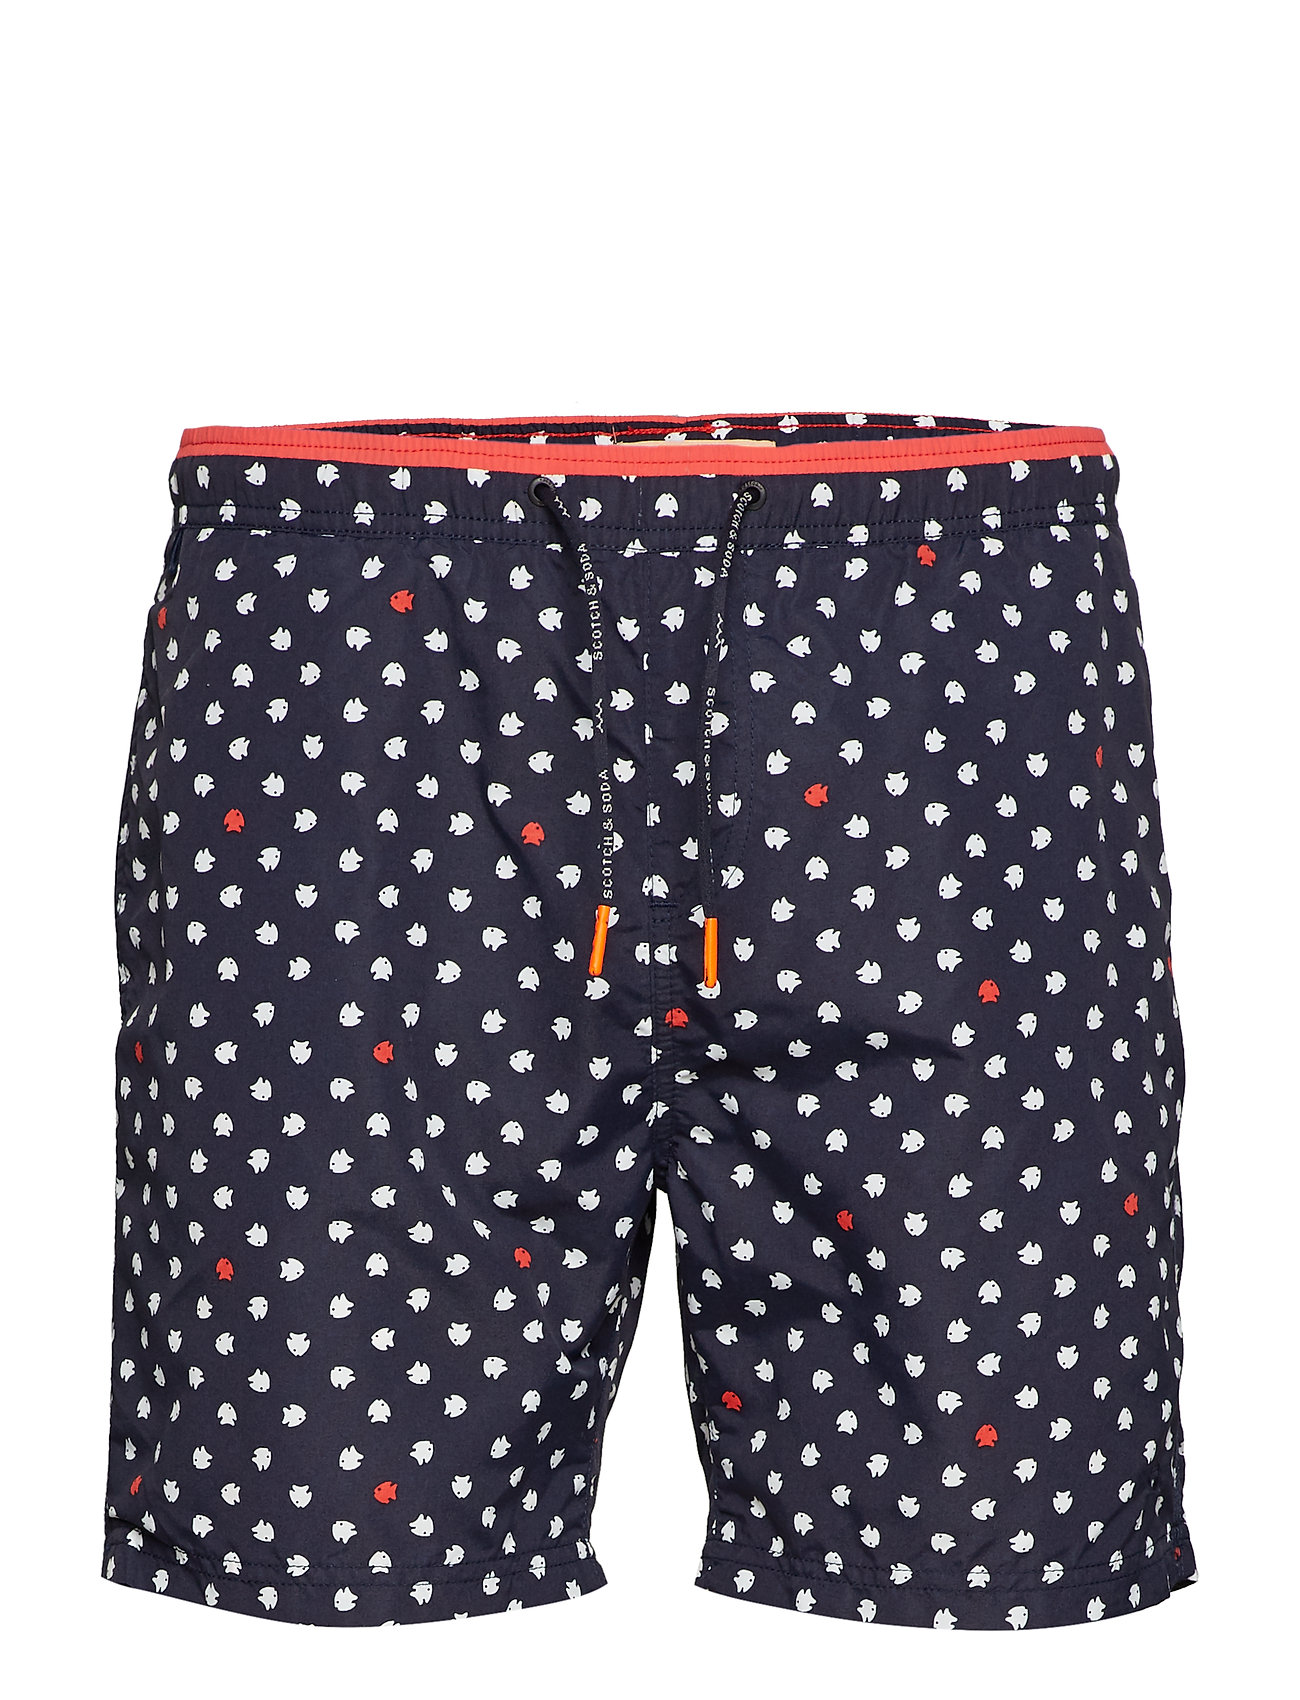 a2f38653b3 Scotch & Soda Bright swimshort with contrast waistband - Swimwear